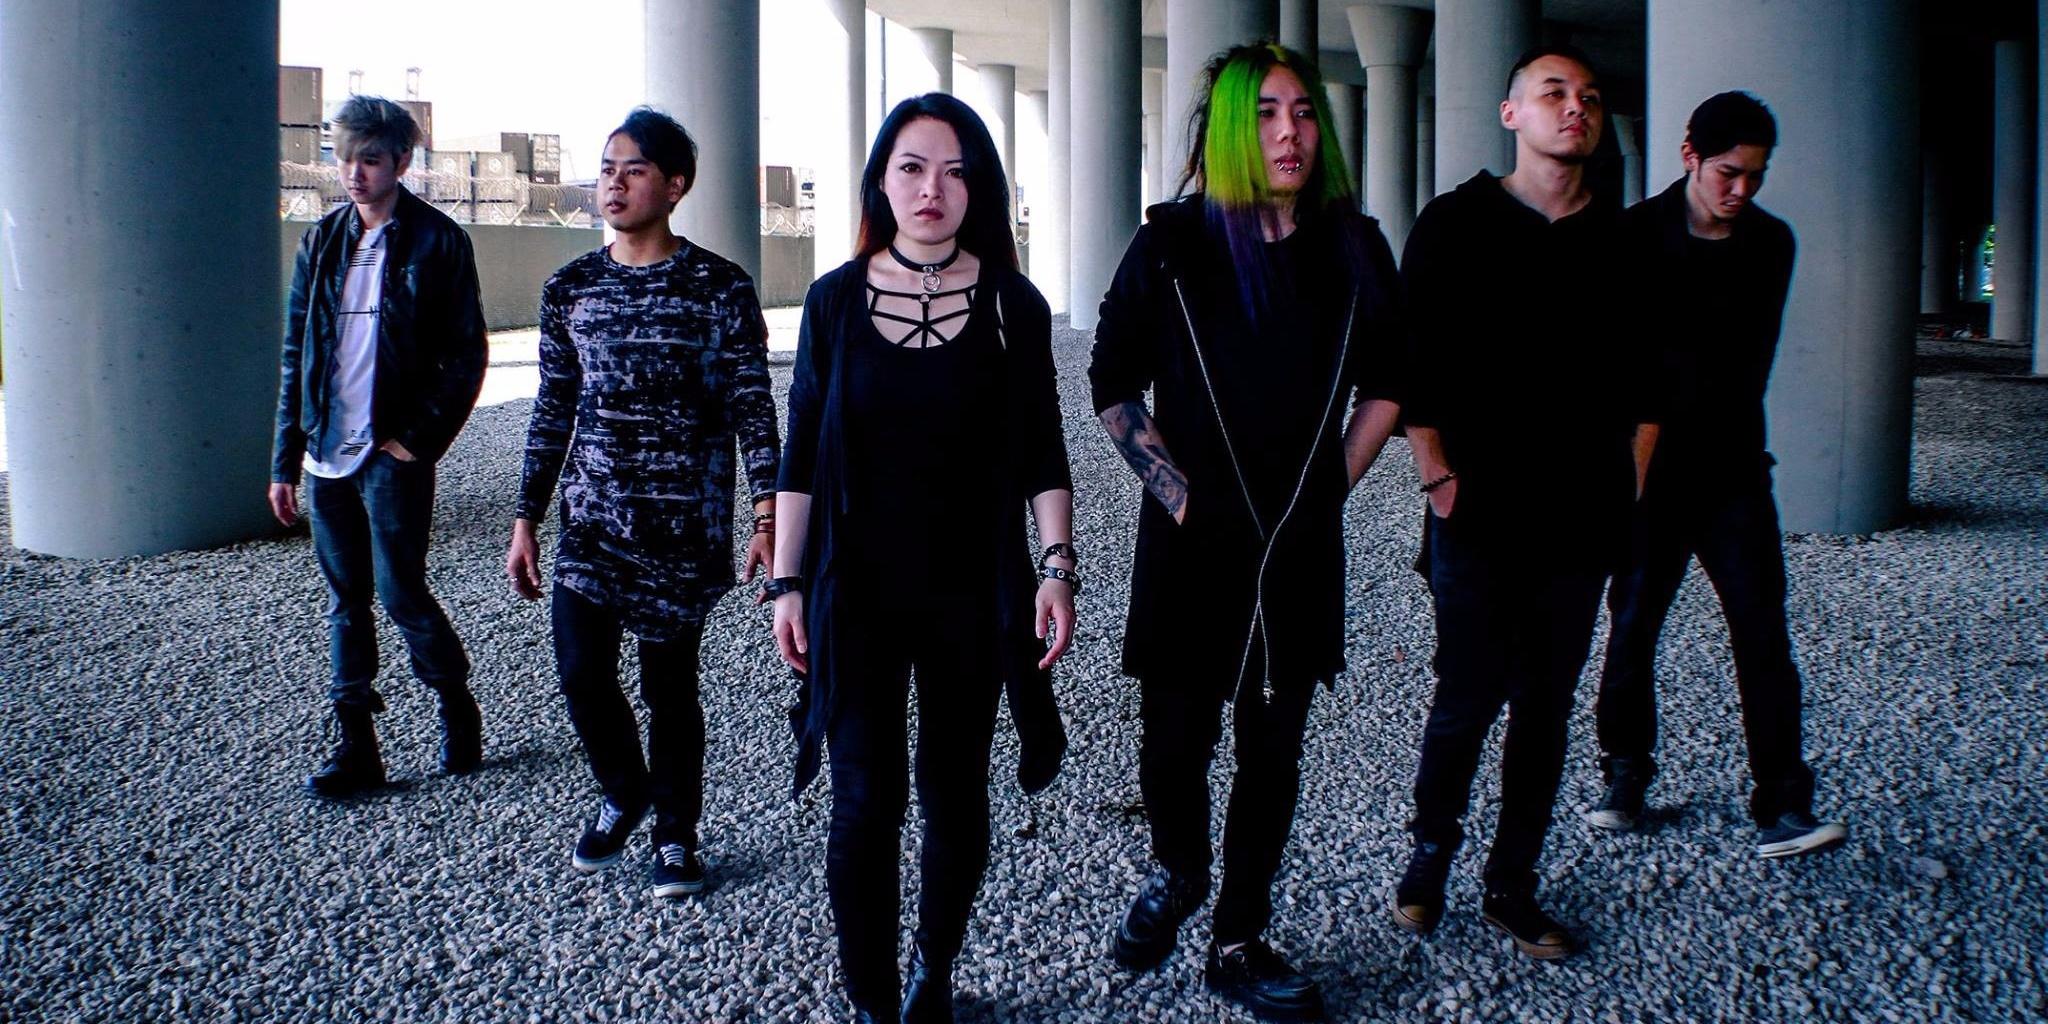 PREMIERE: Vivienne's Verdict rocks you like a 'Hurricane' on their creepy new music video